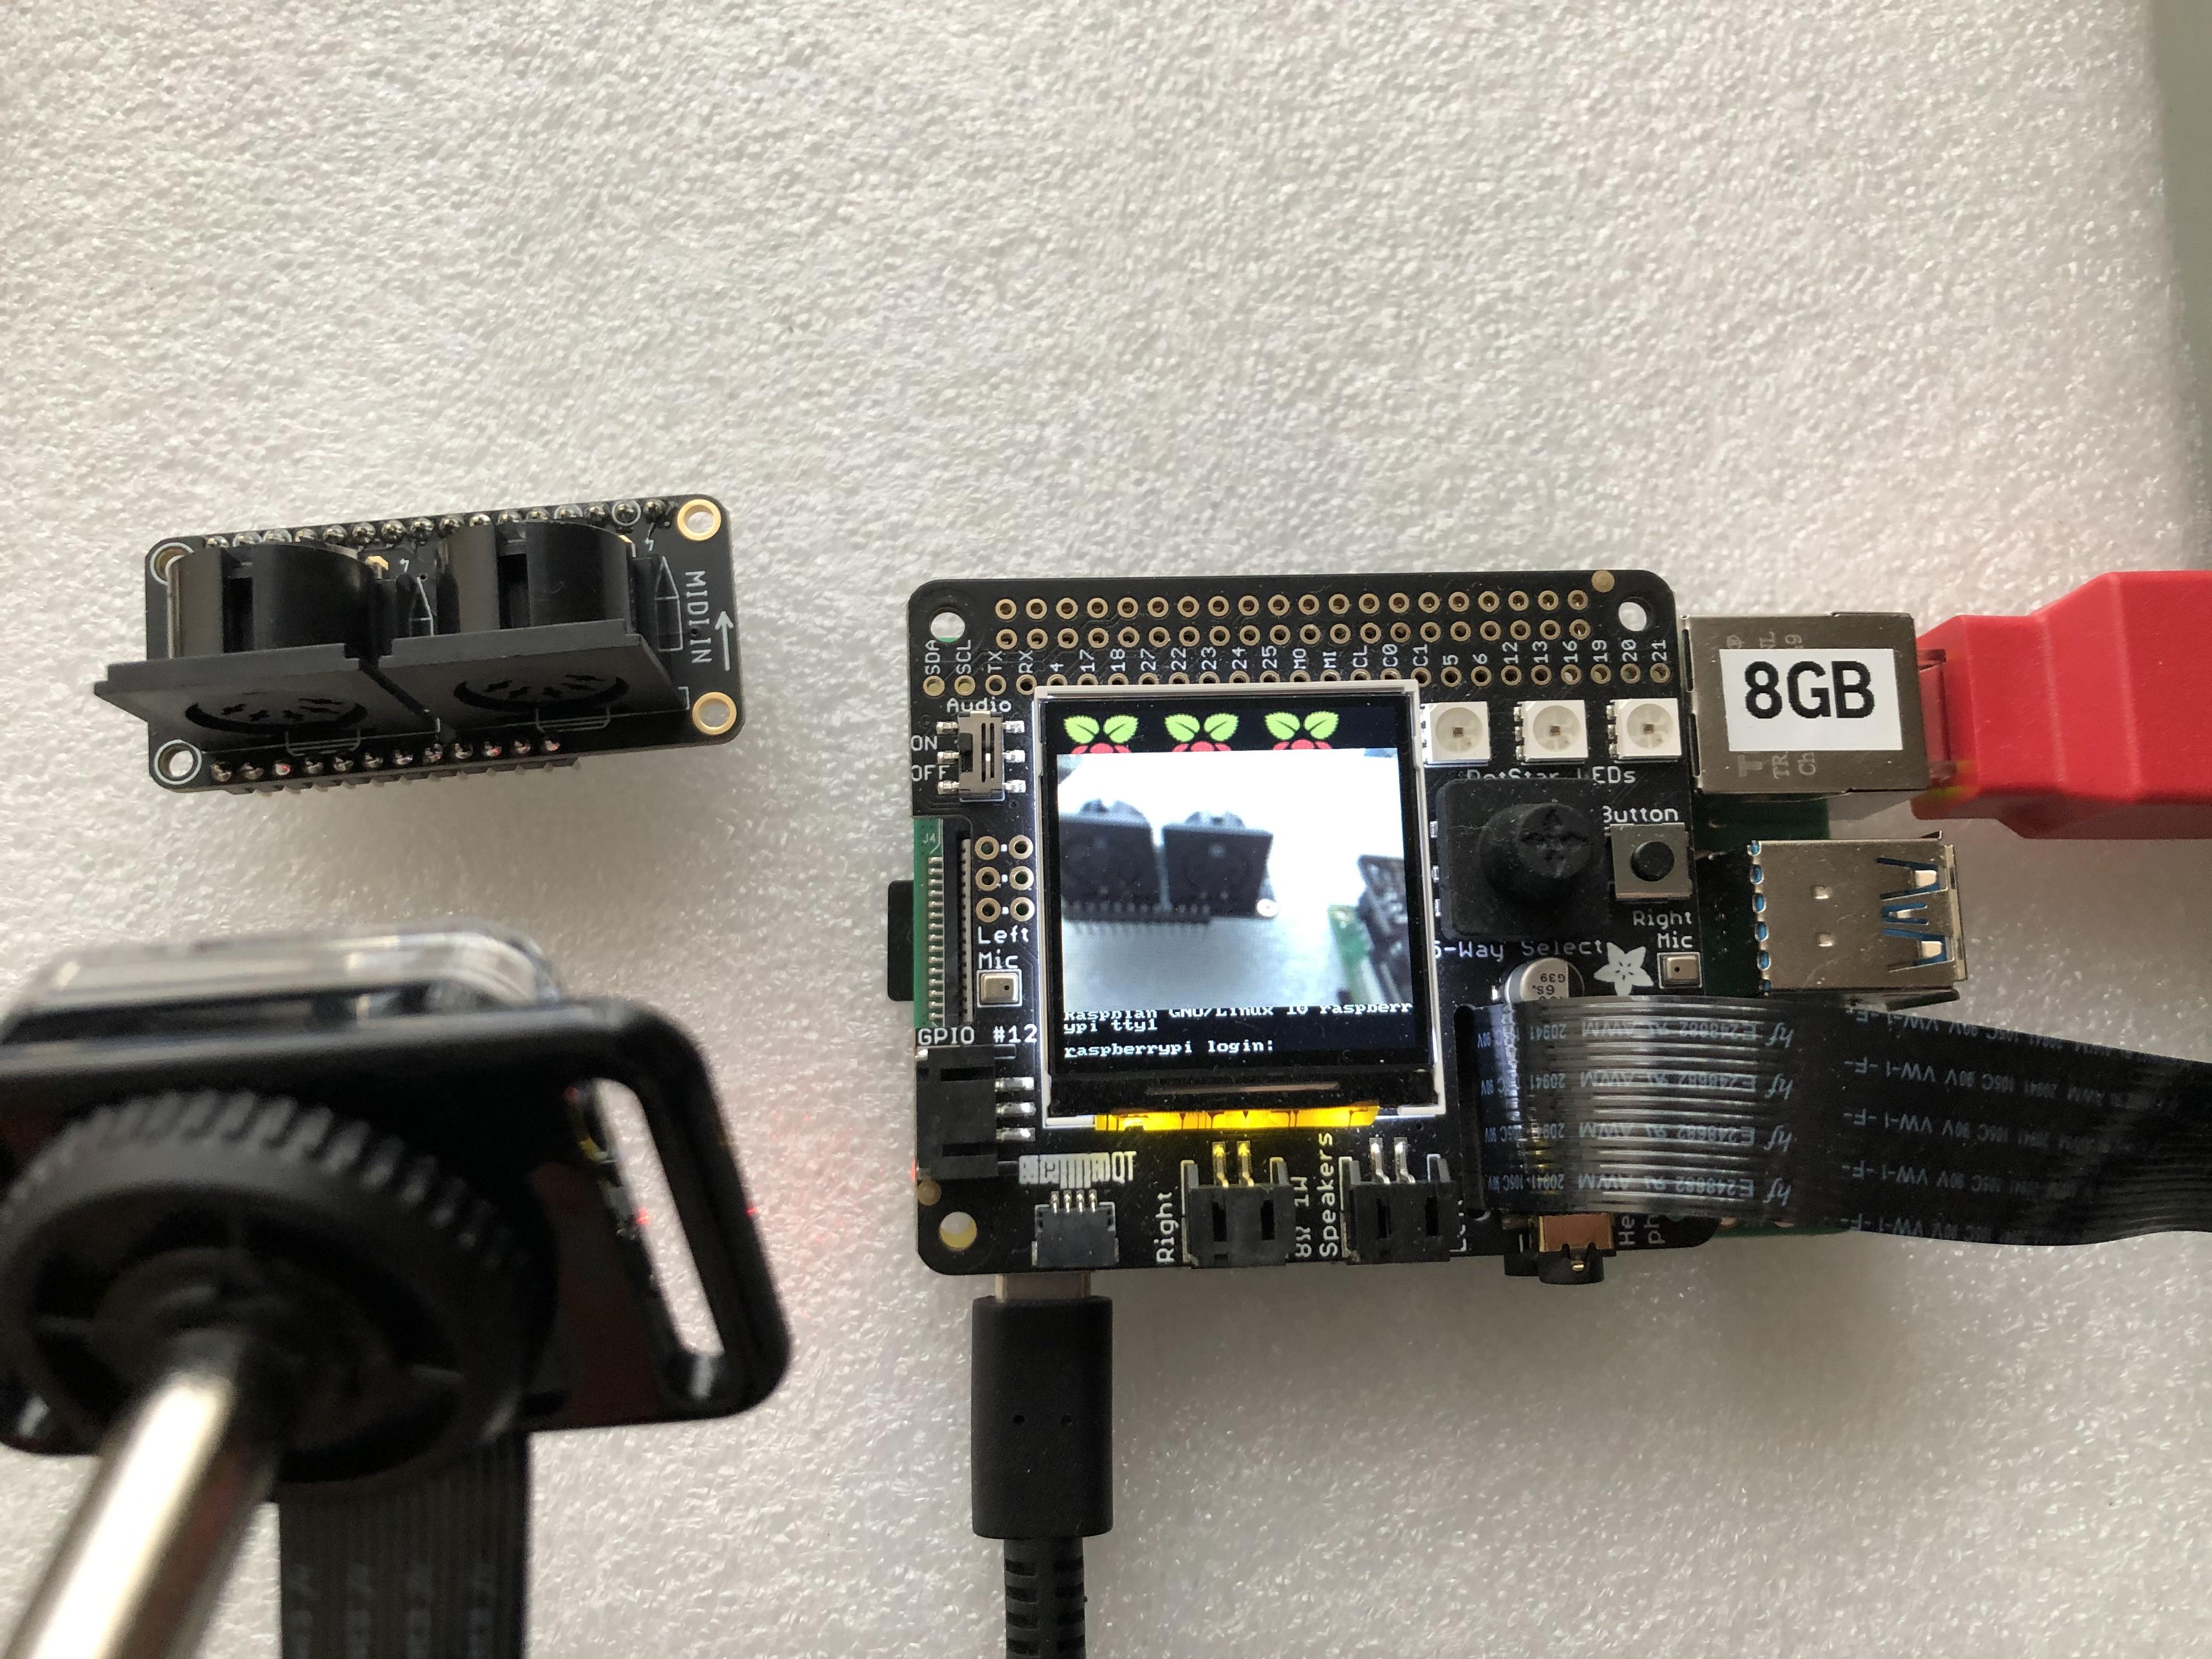 adafruit_products_Camera_Test.jpeg